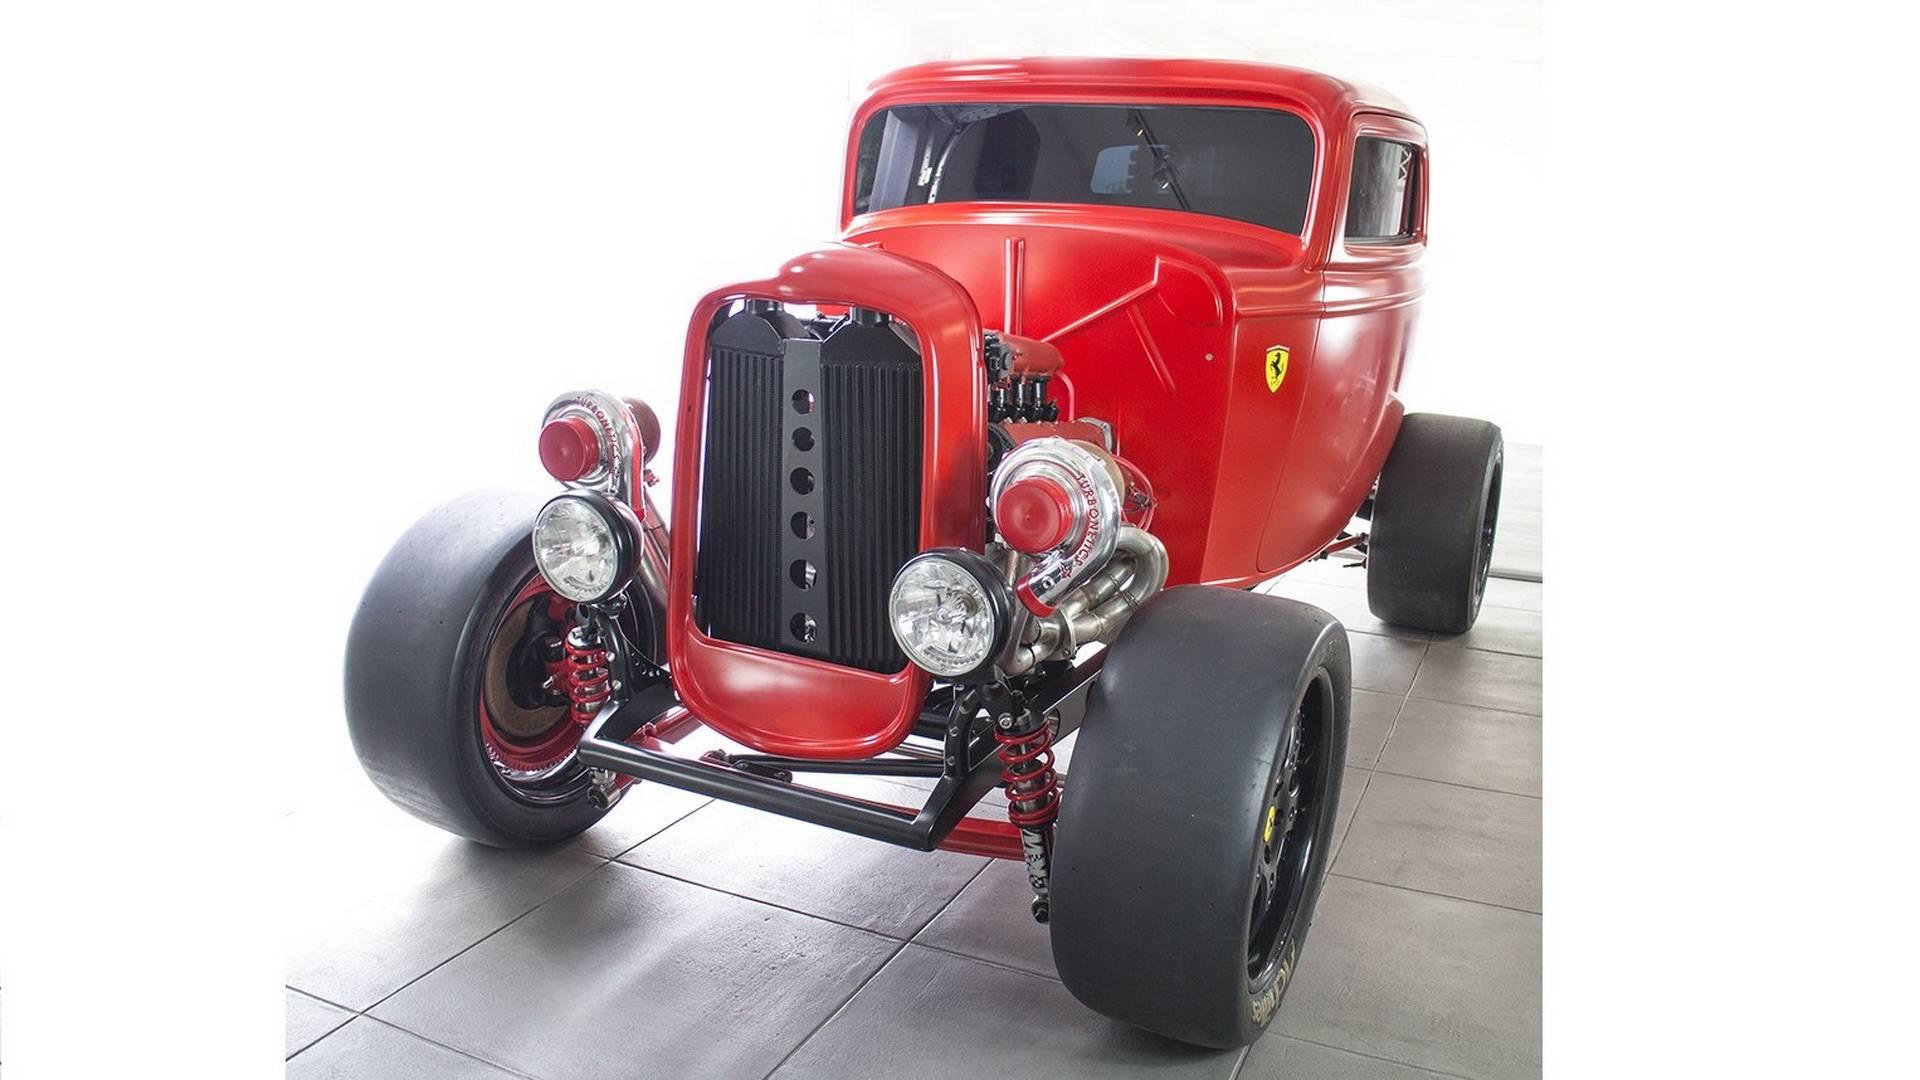 1932 Ford With 950-HP Biturbo Ferrari Engine Is Retro Crazy